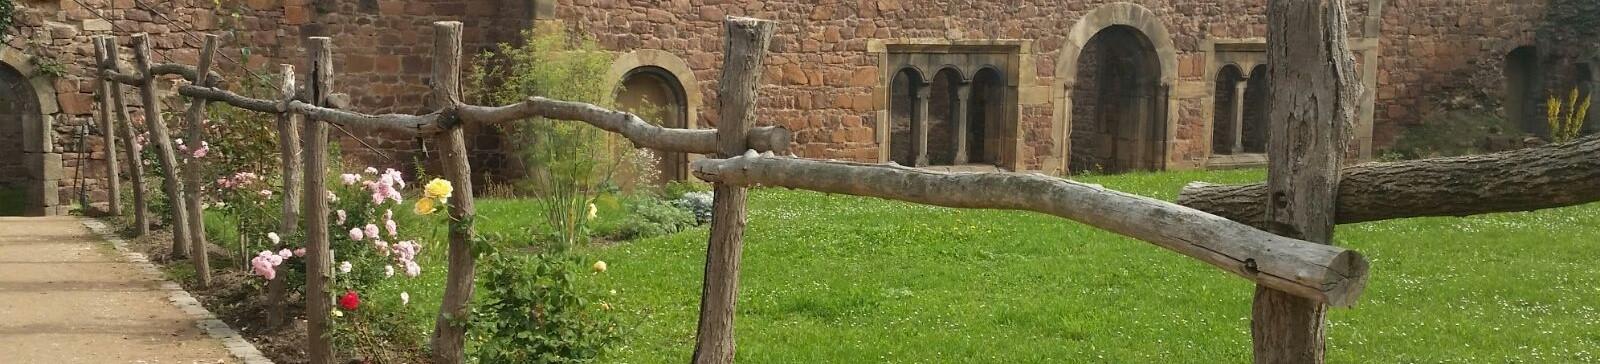 Sliderbild Kloster 2